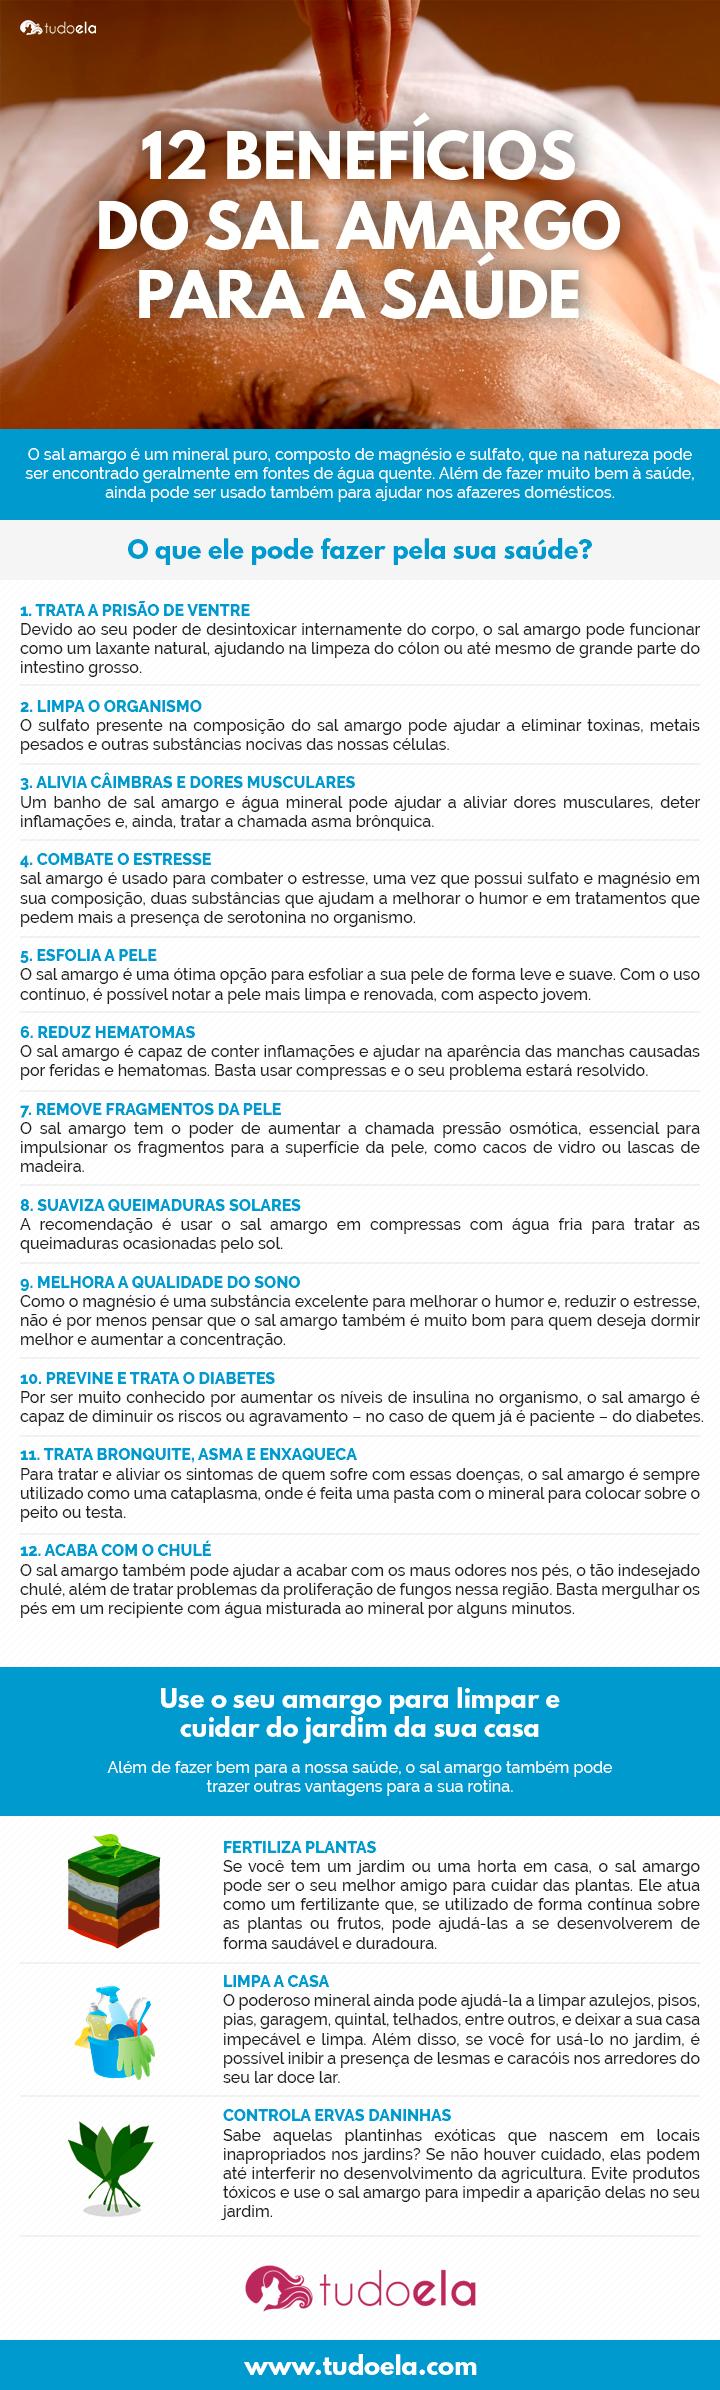 Sal amargo benefícios - infográfico